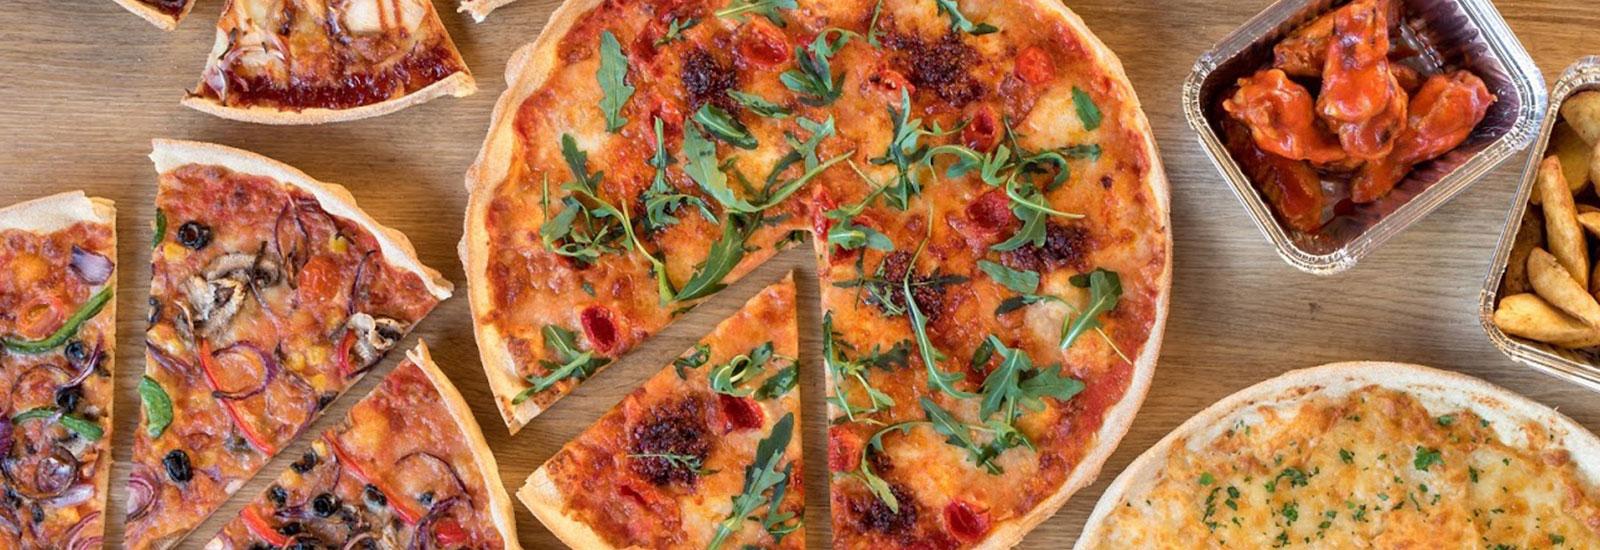 Lytham Pizza Company Lytham Pizza Lytham St Annes